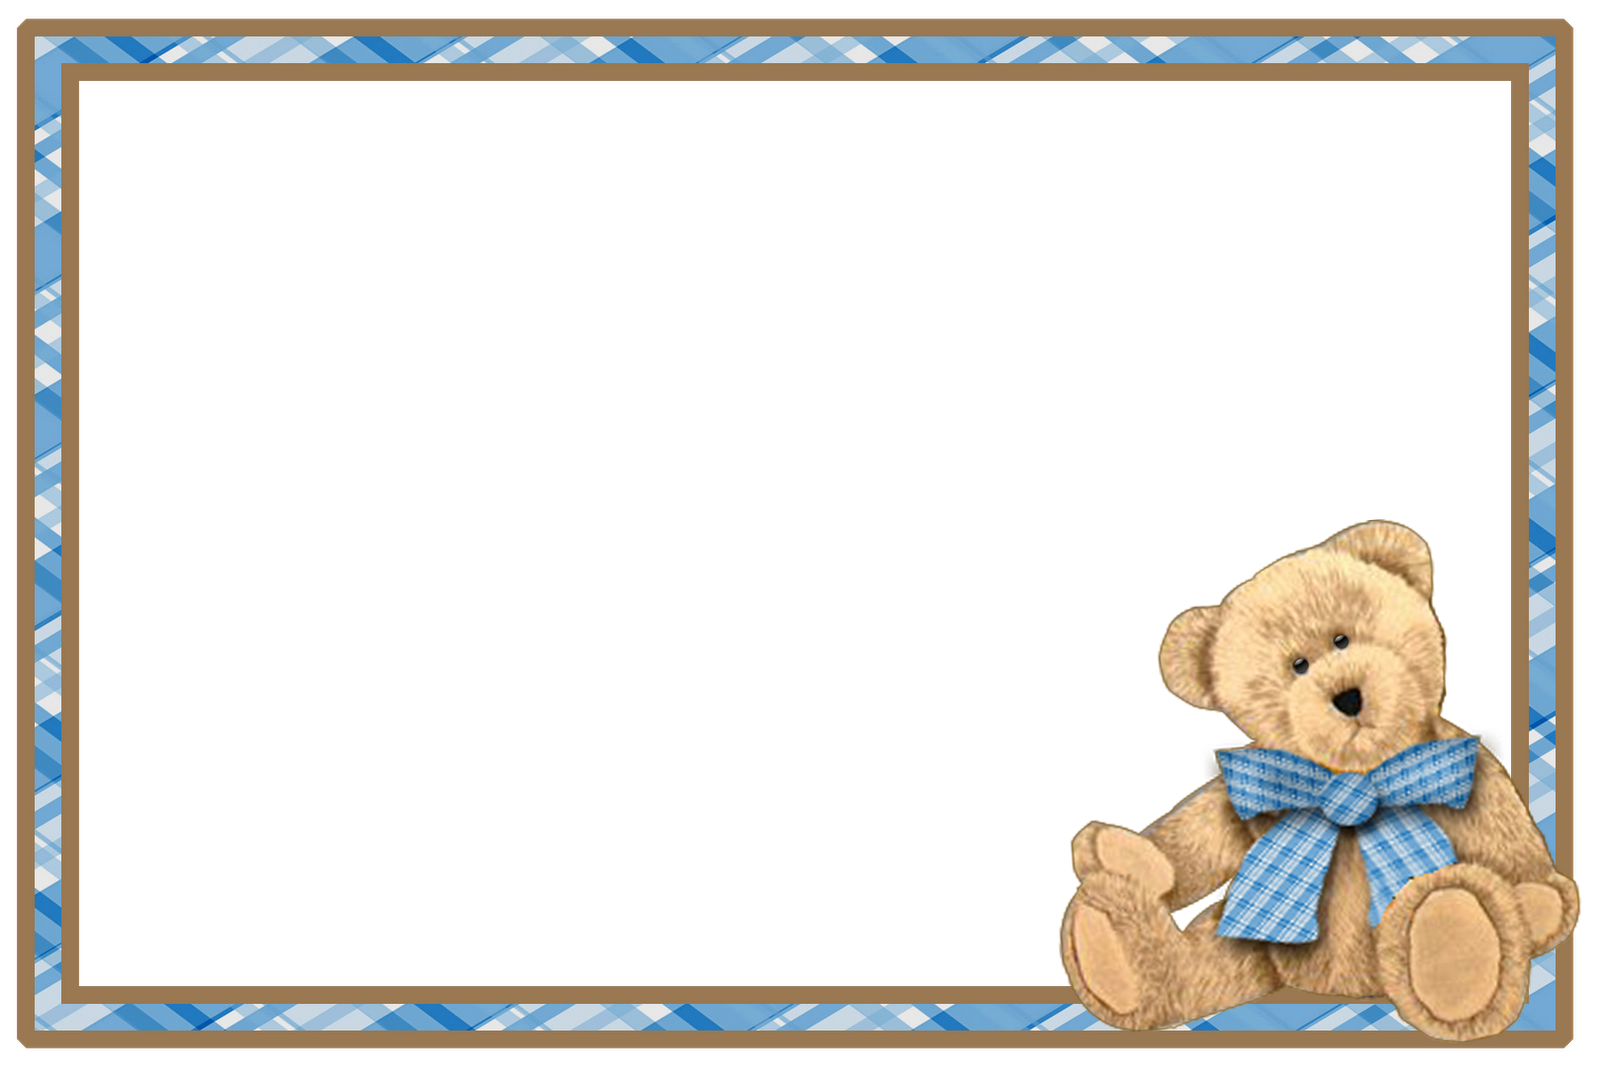 Teddy Bear Bed For Sale